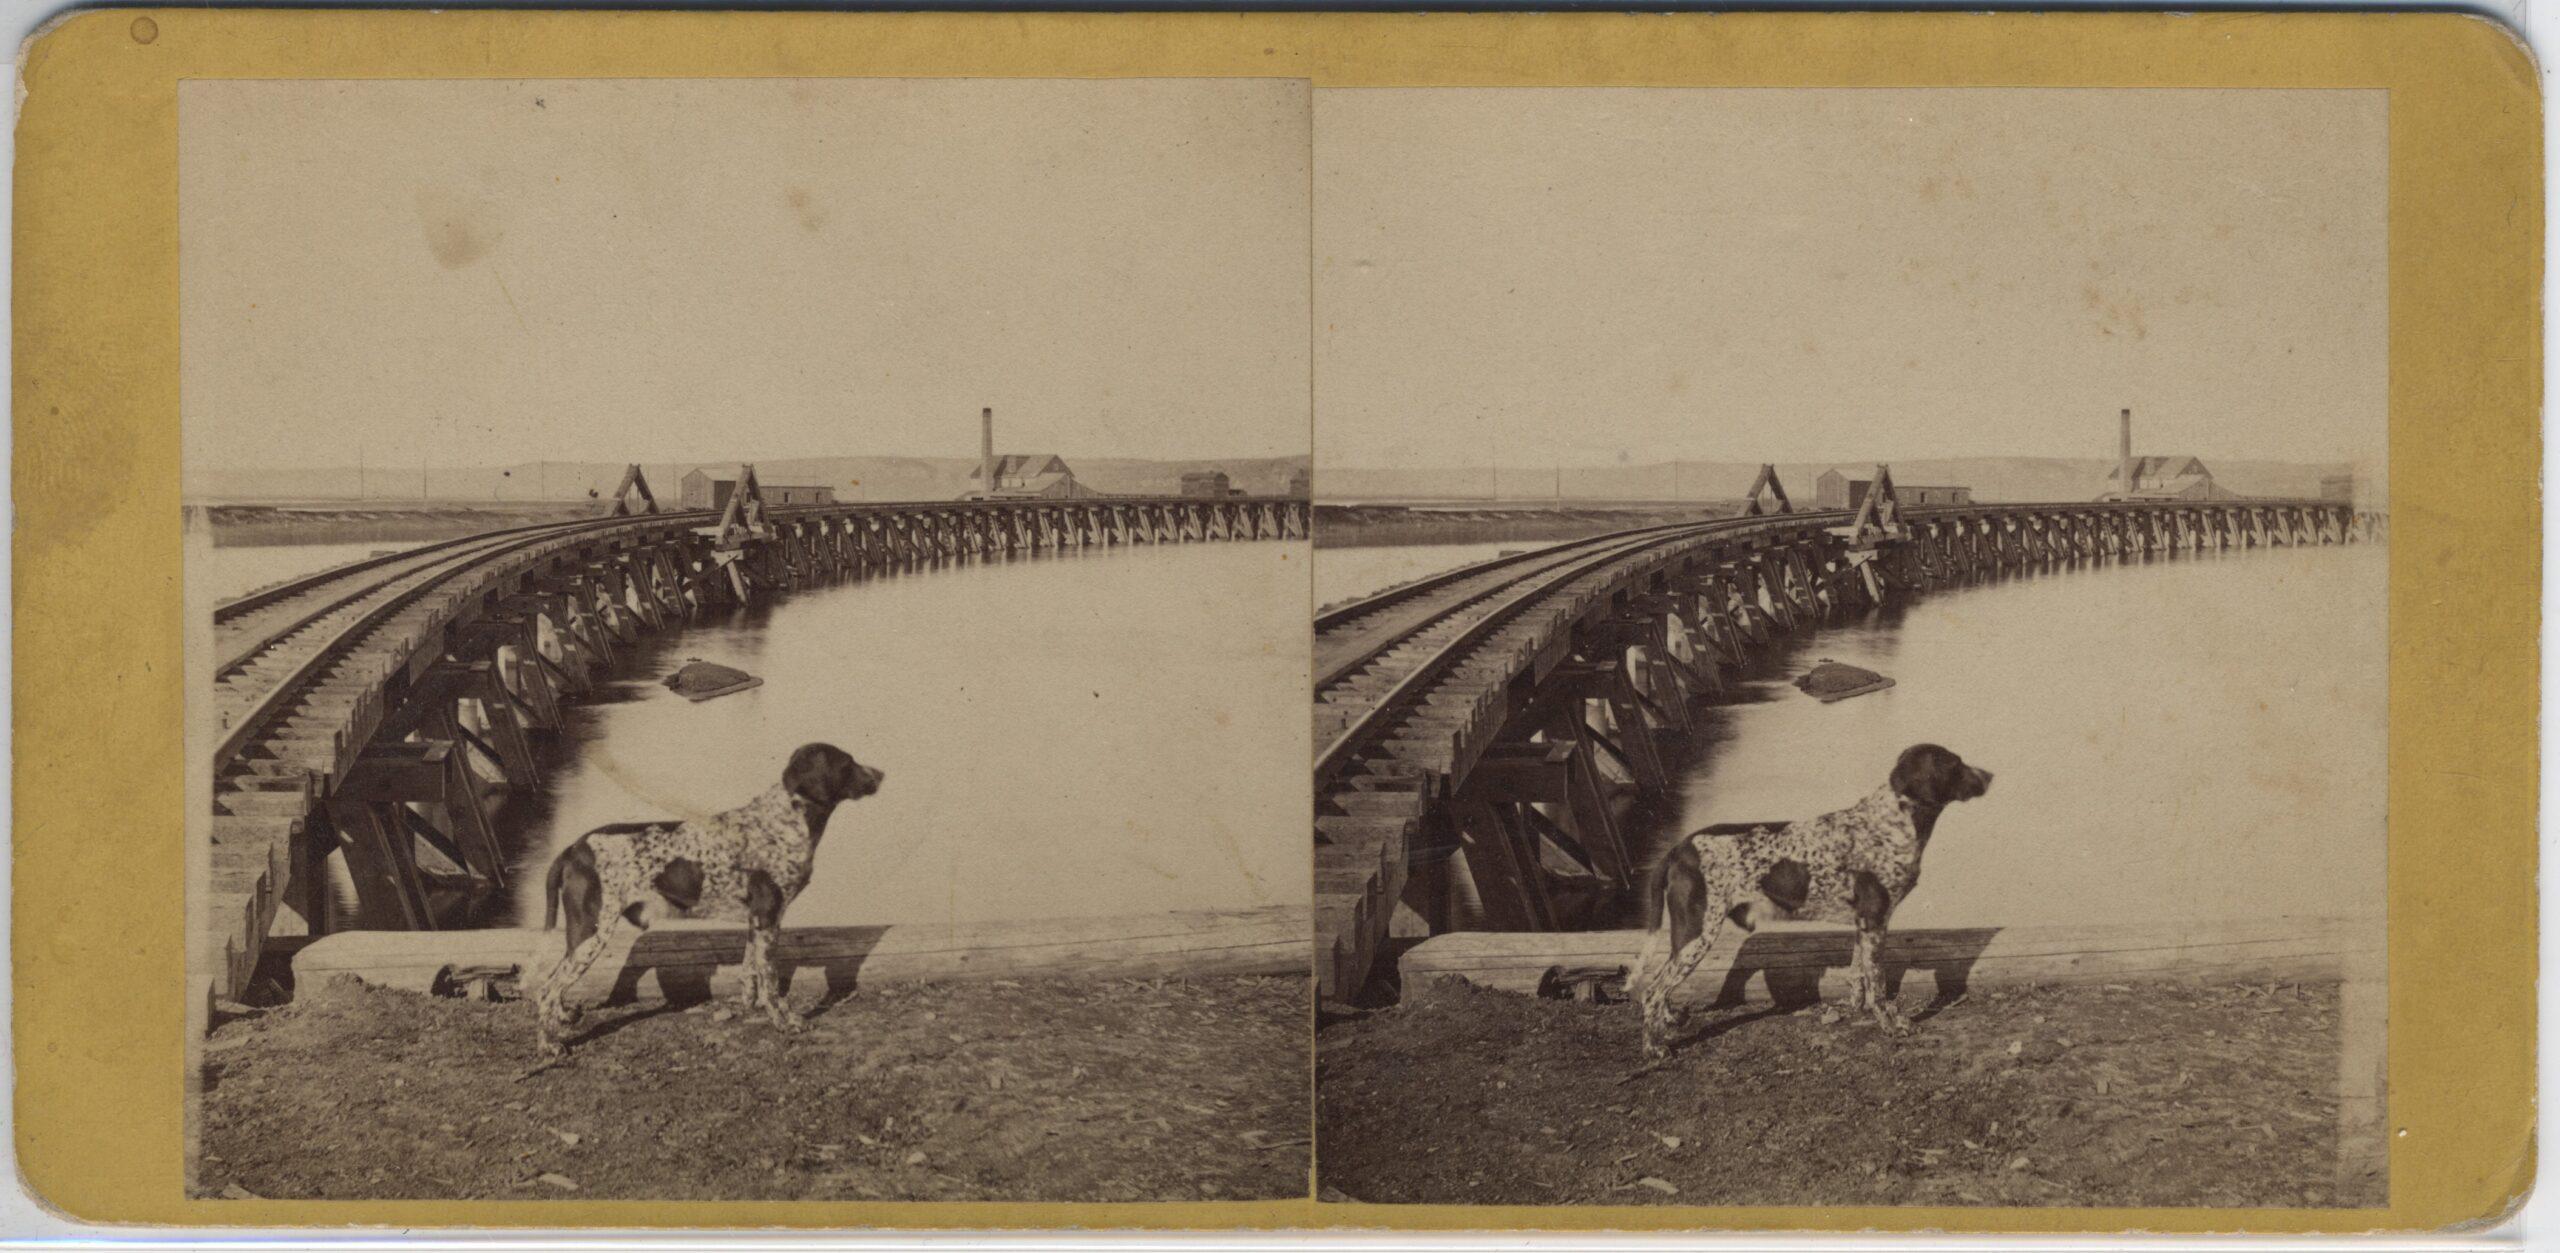 LJTP 100.243 - S. Root - Railroad Bridge Approach - c1870